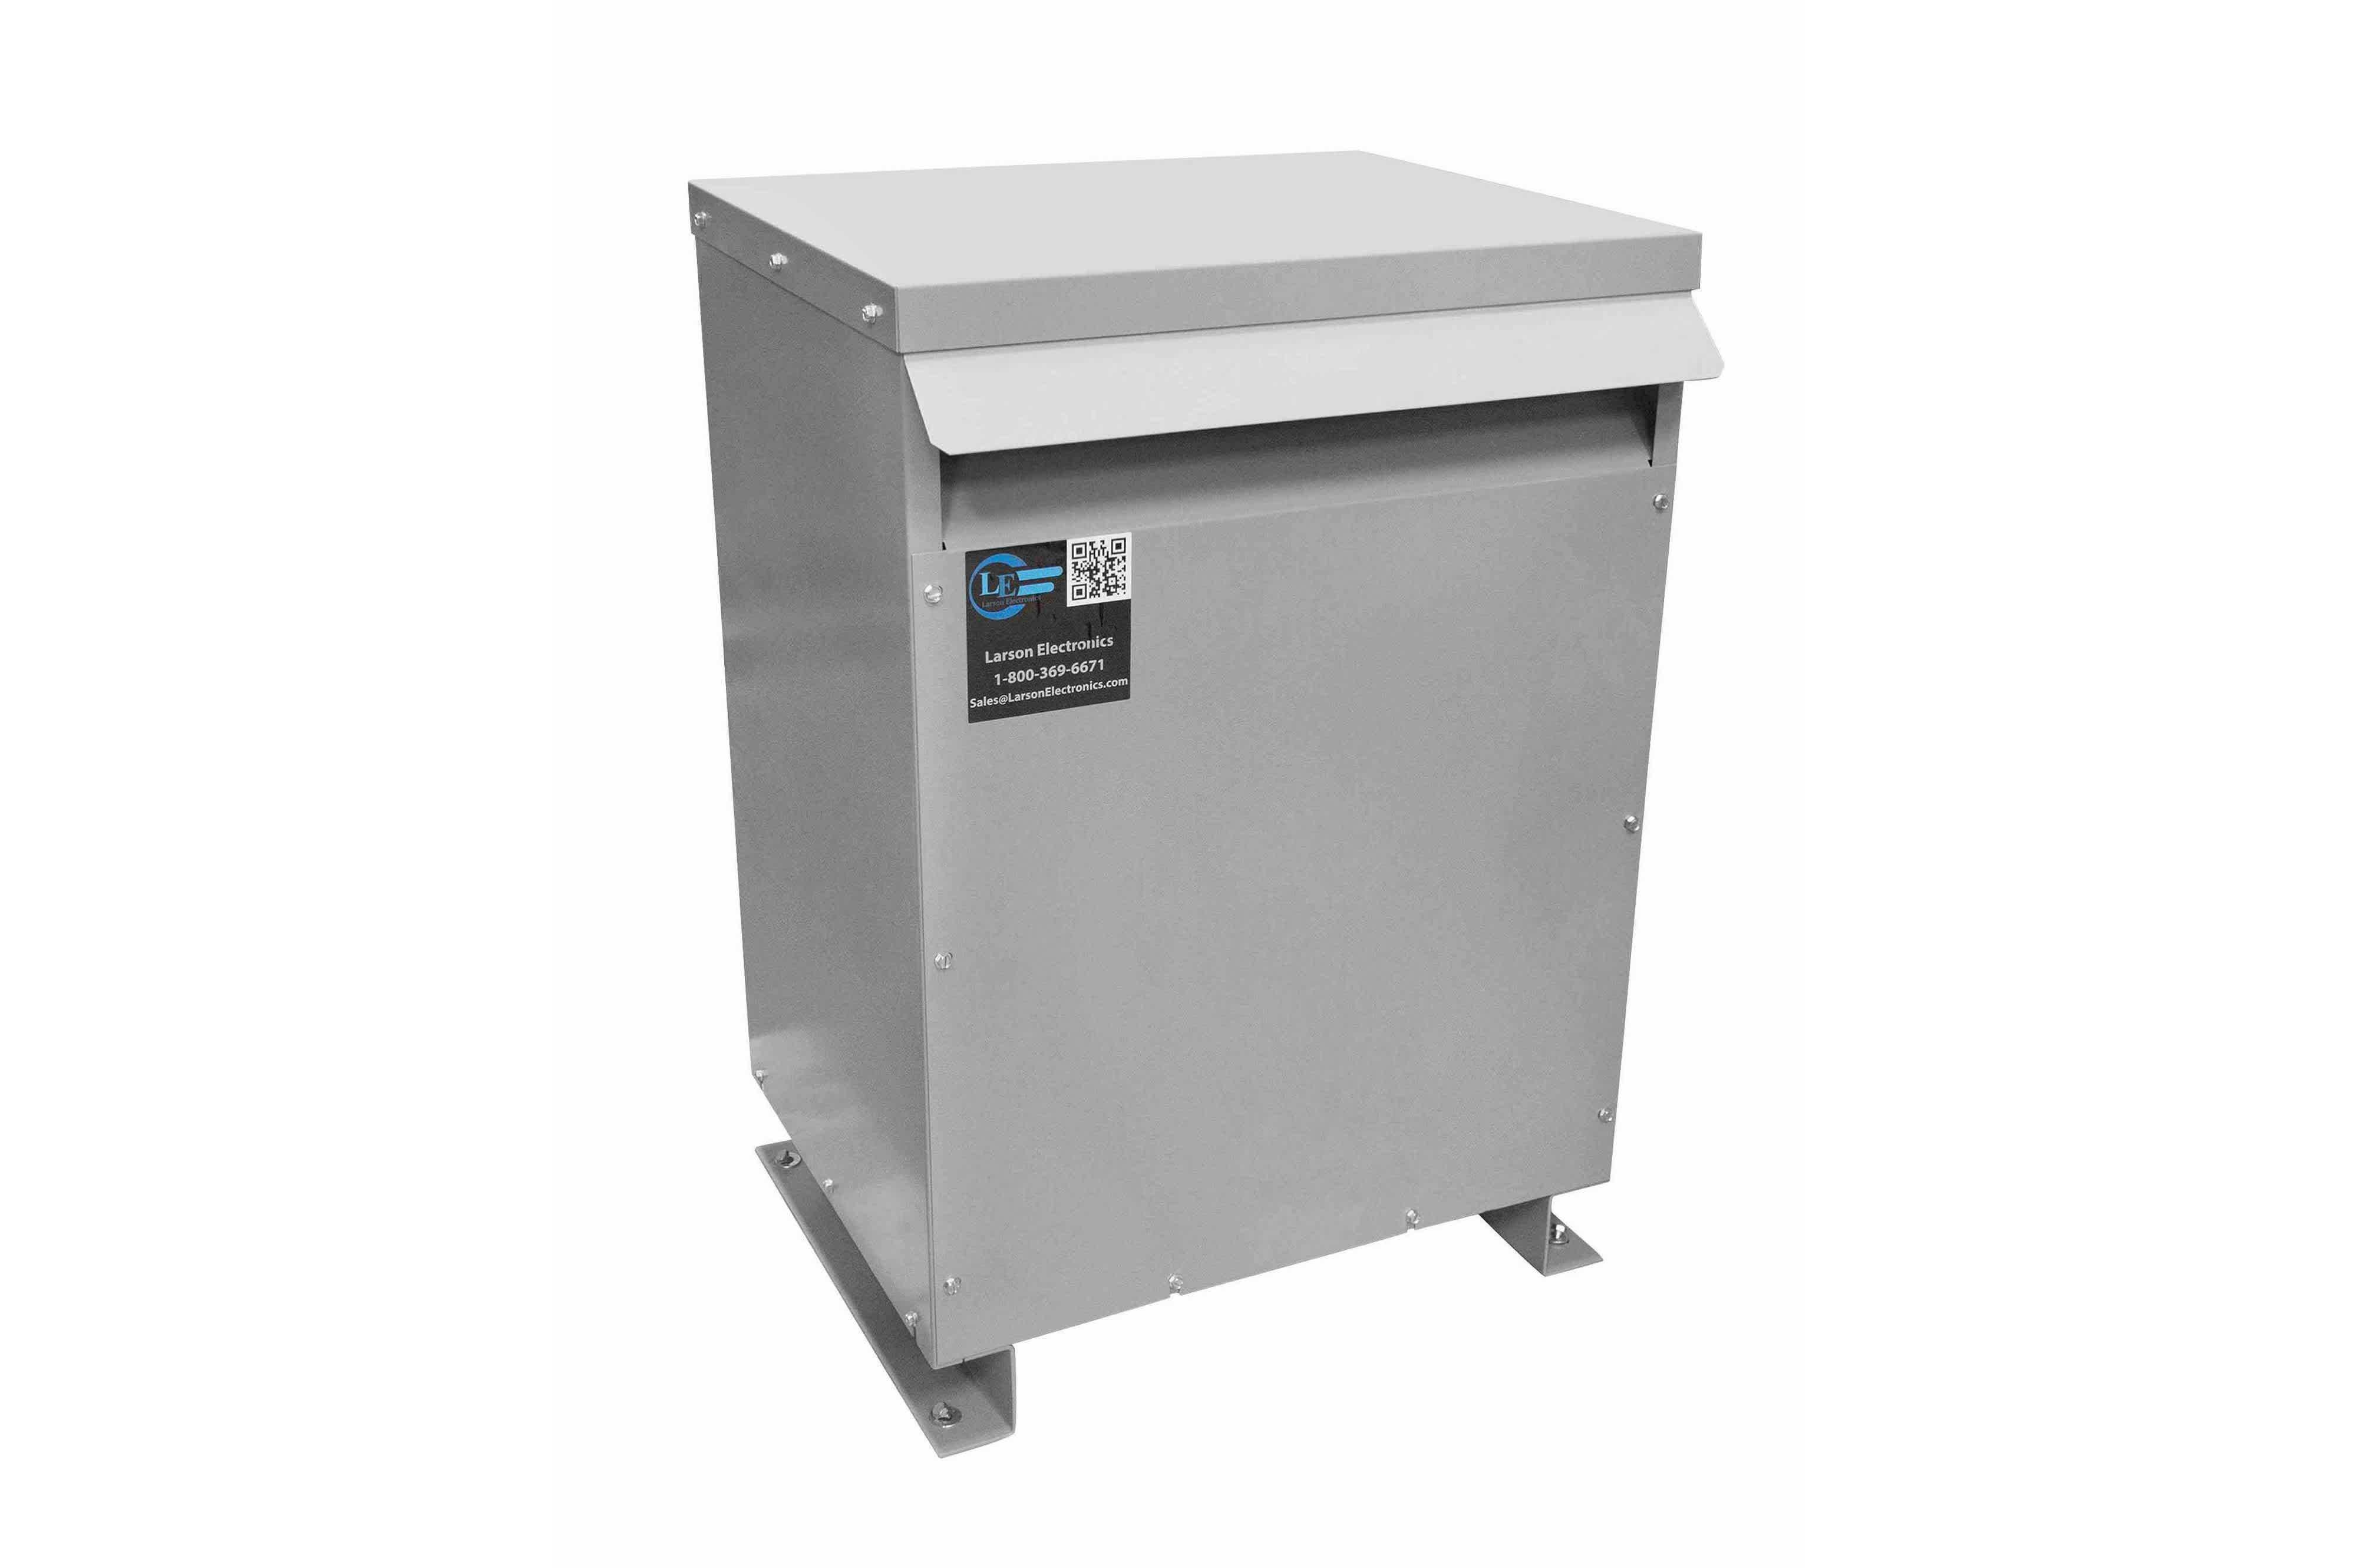 137.5 kVA 3PH Isolation Transformer, 575V Wye Primary, 400Y/231 Wye-N Secondary, N3R, Ventilated, 60 Hz